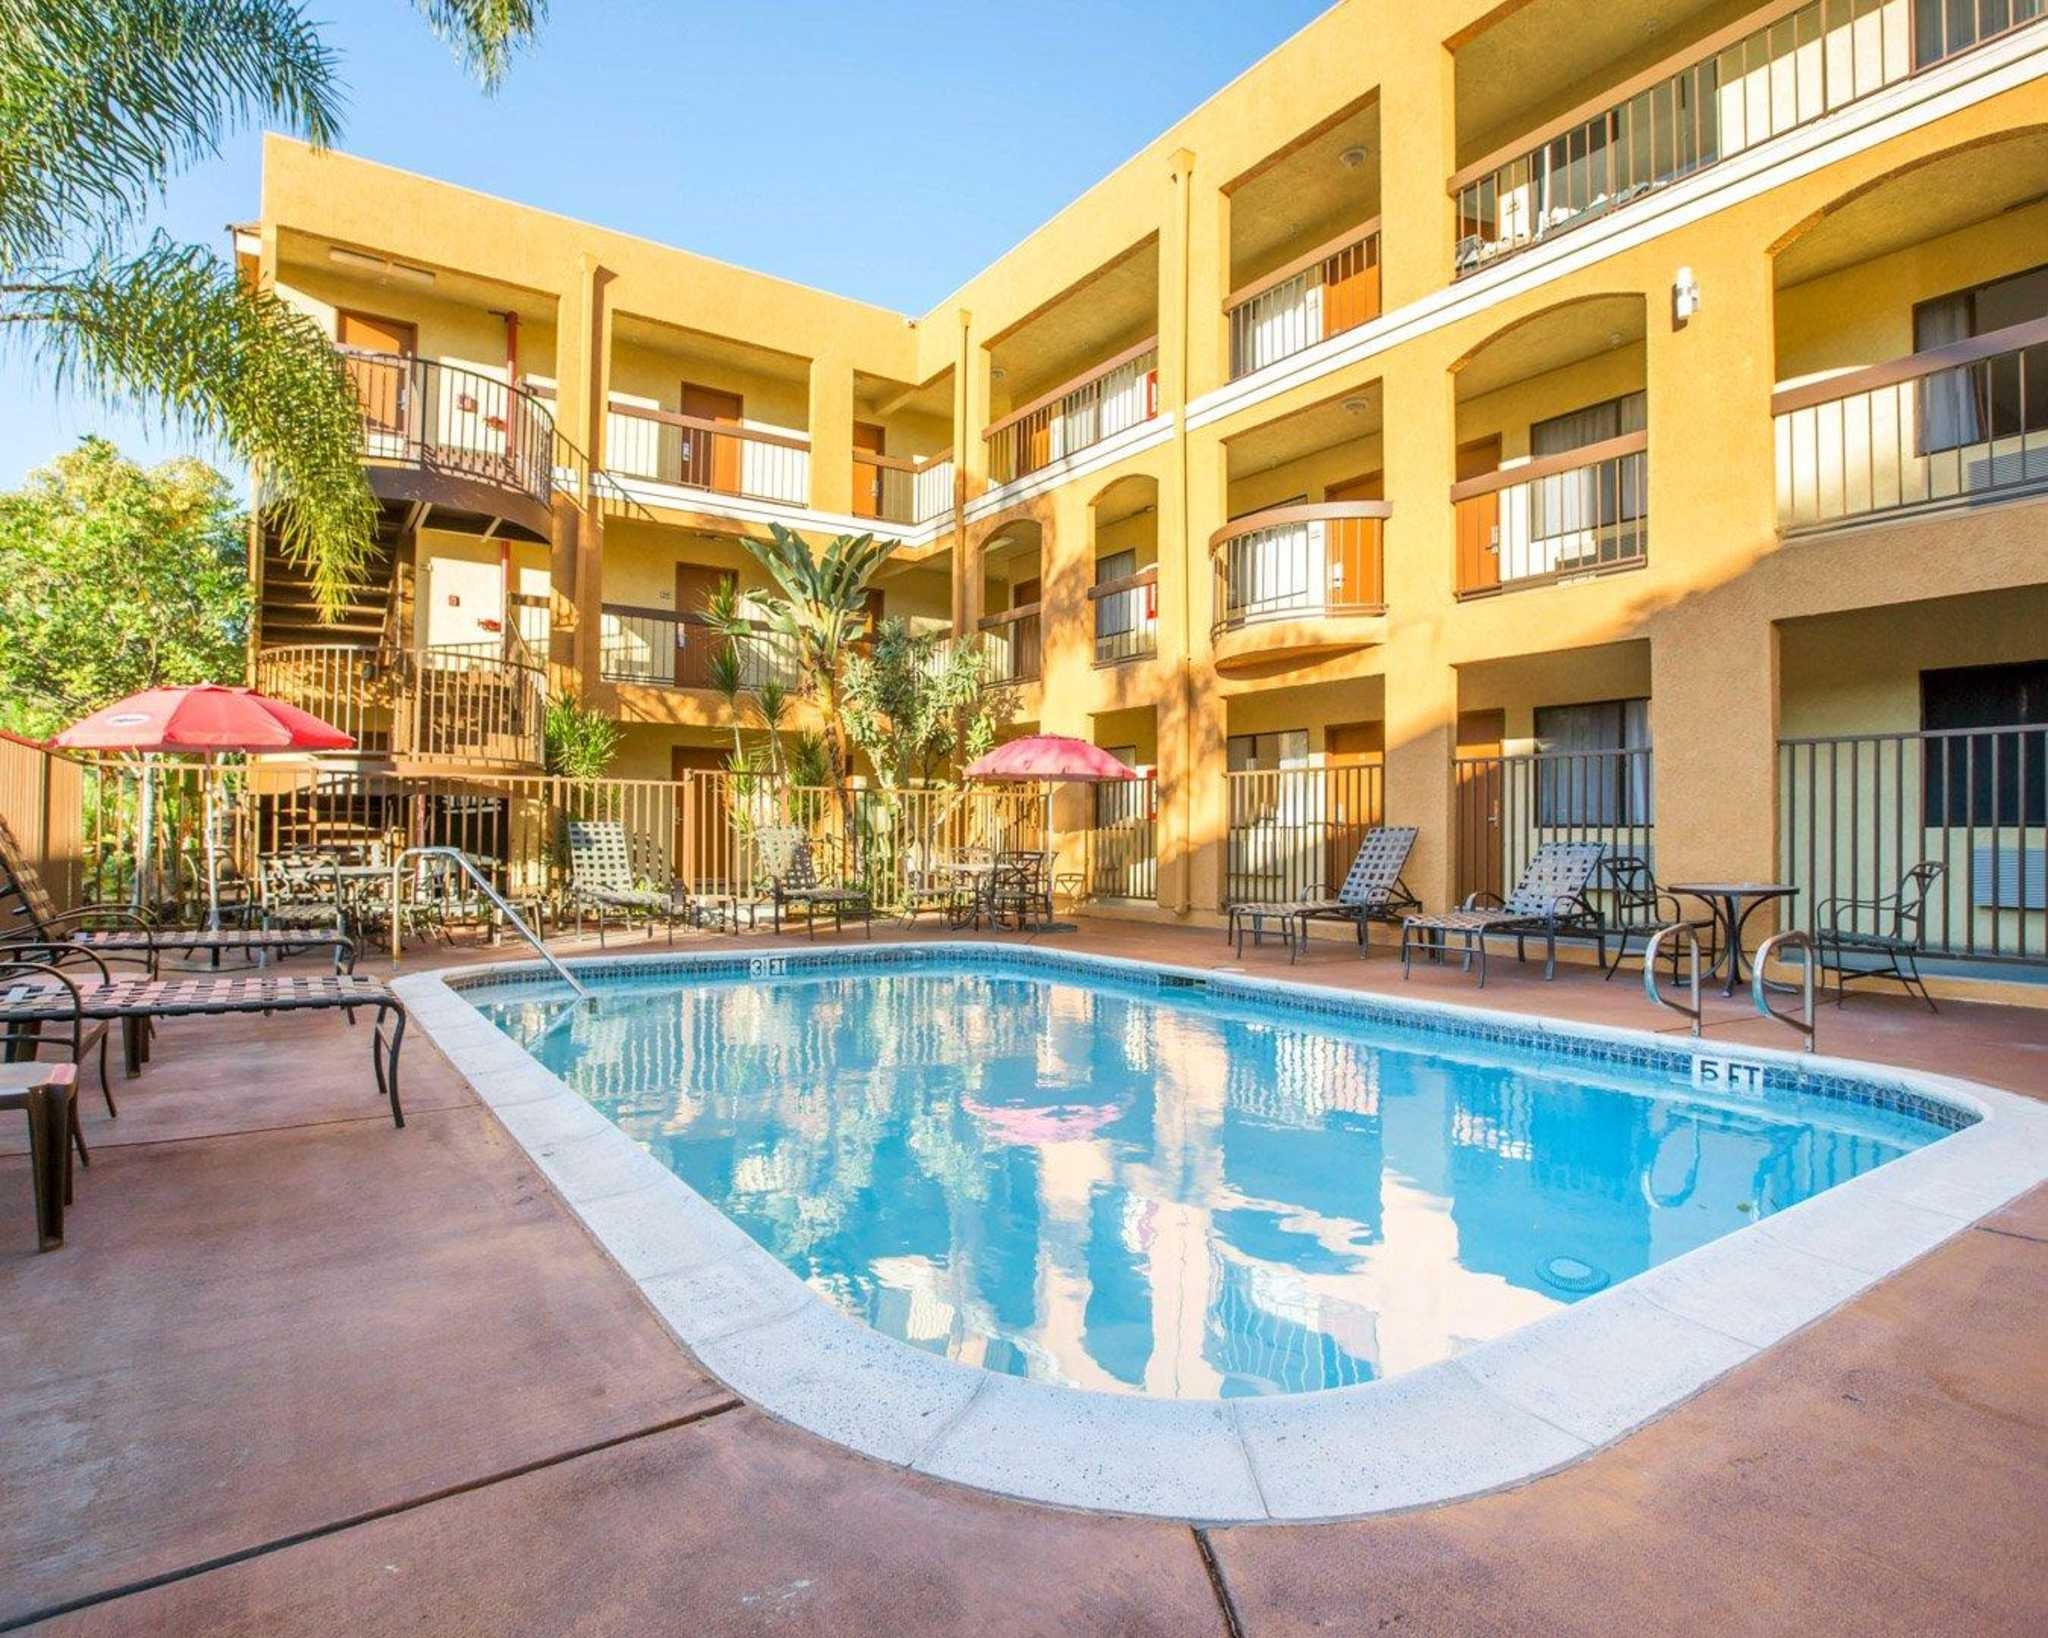 Quality Inn – Affordable Hotels in Anaheim, CA